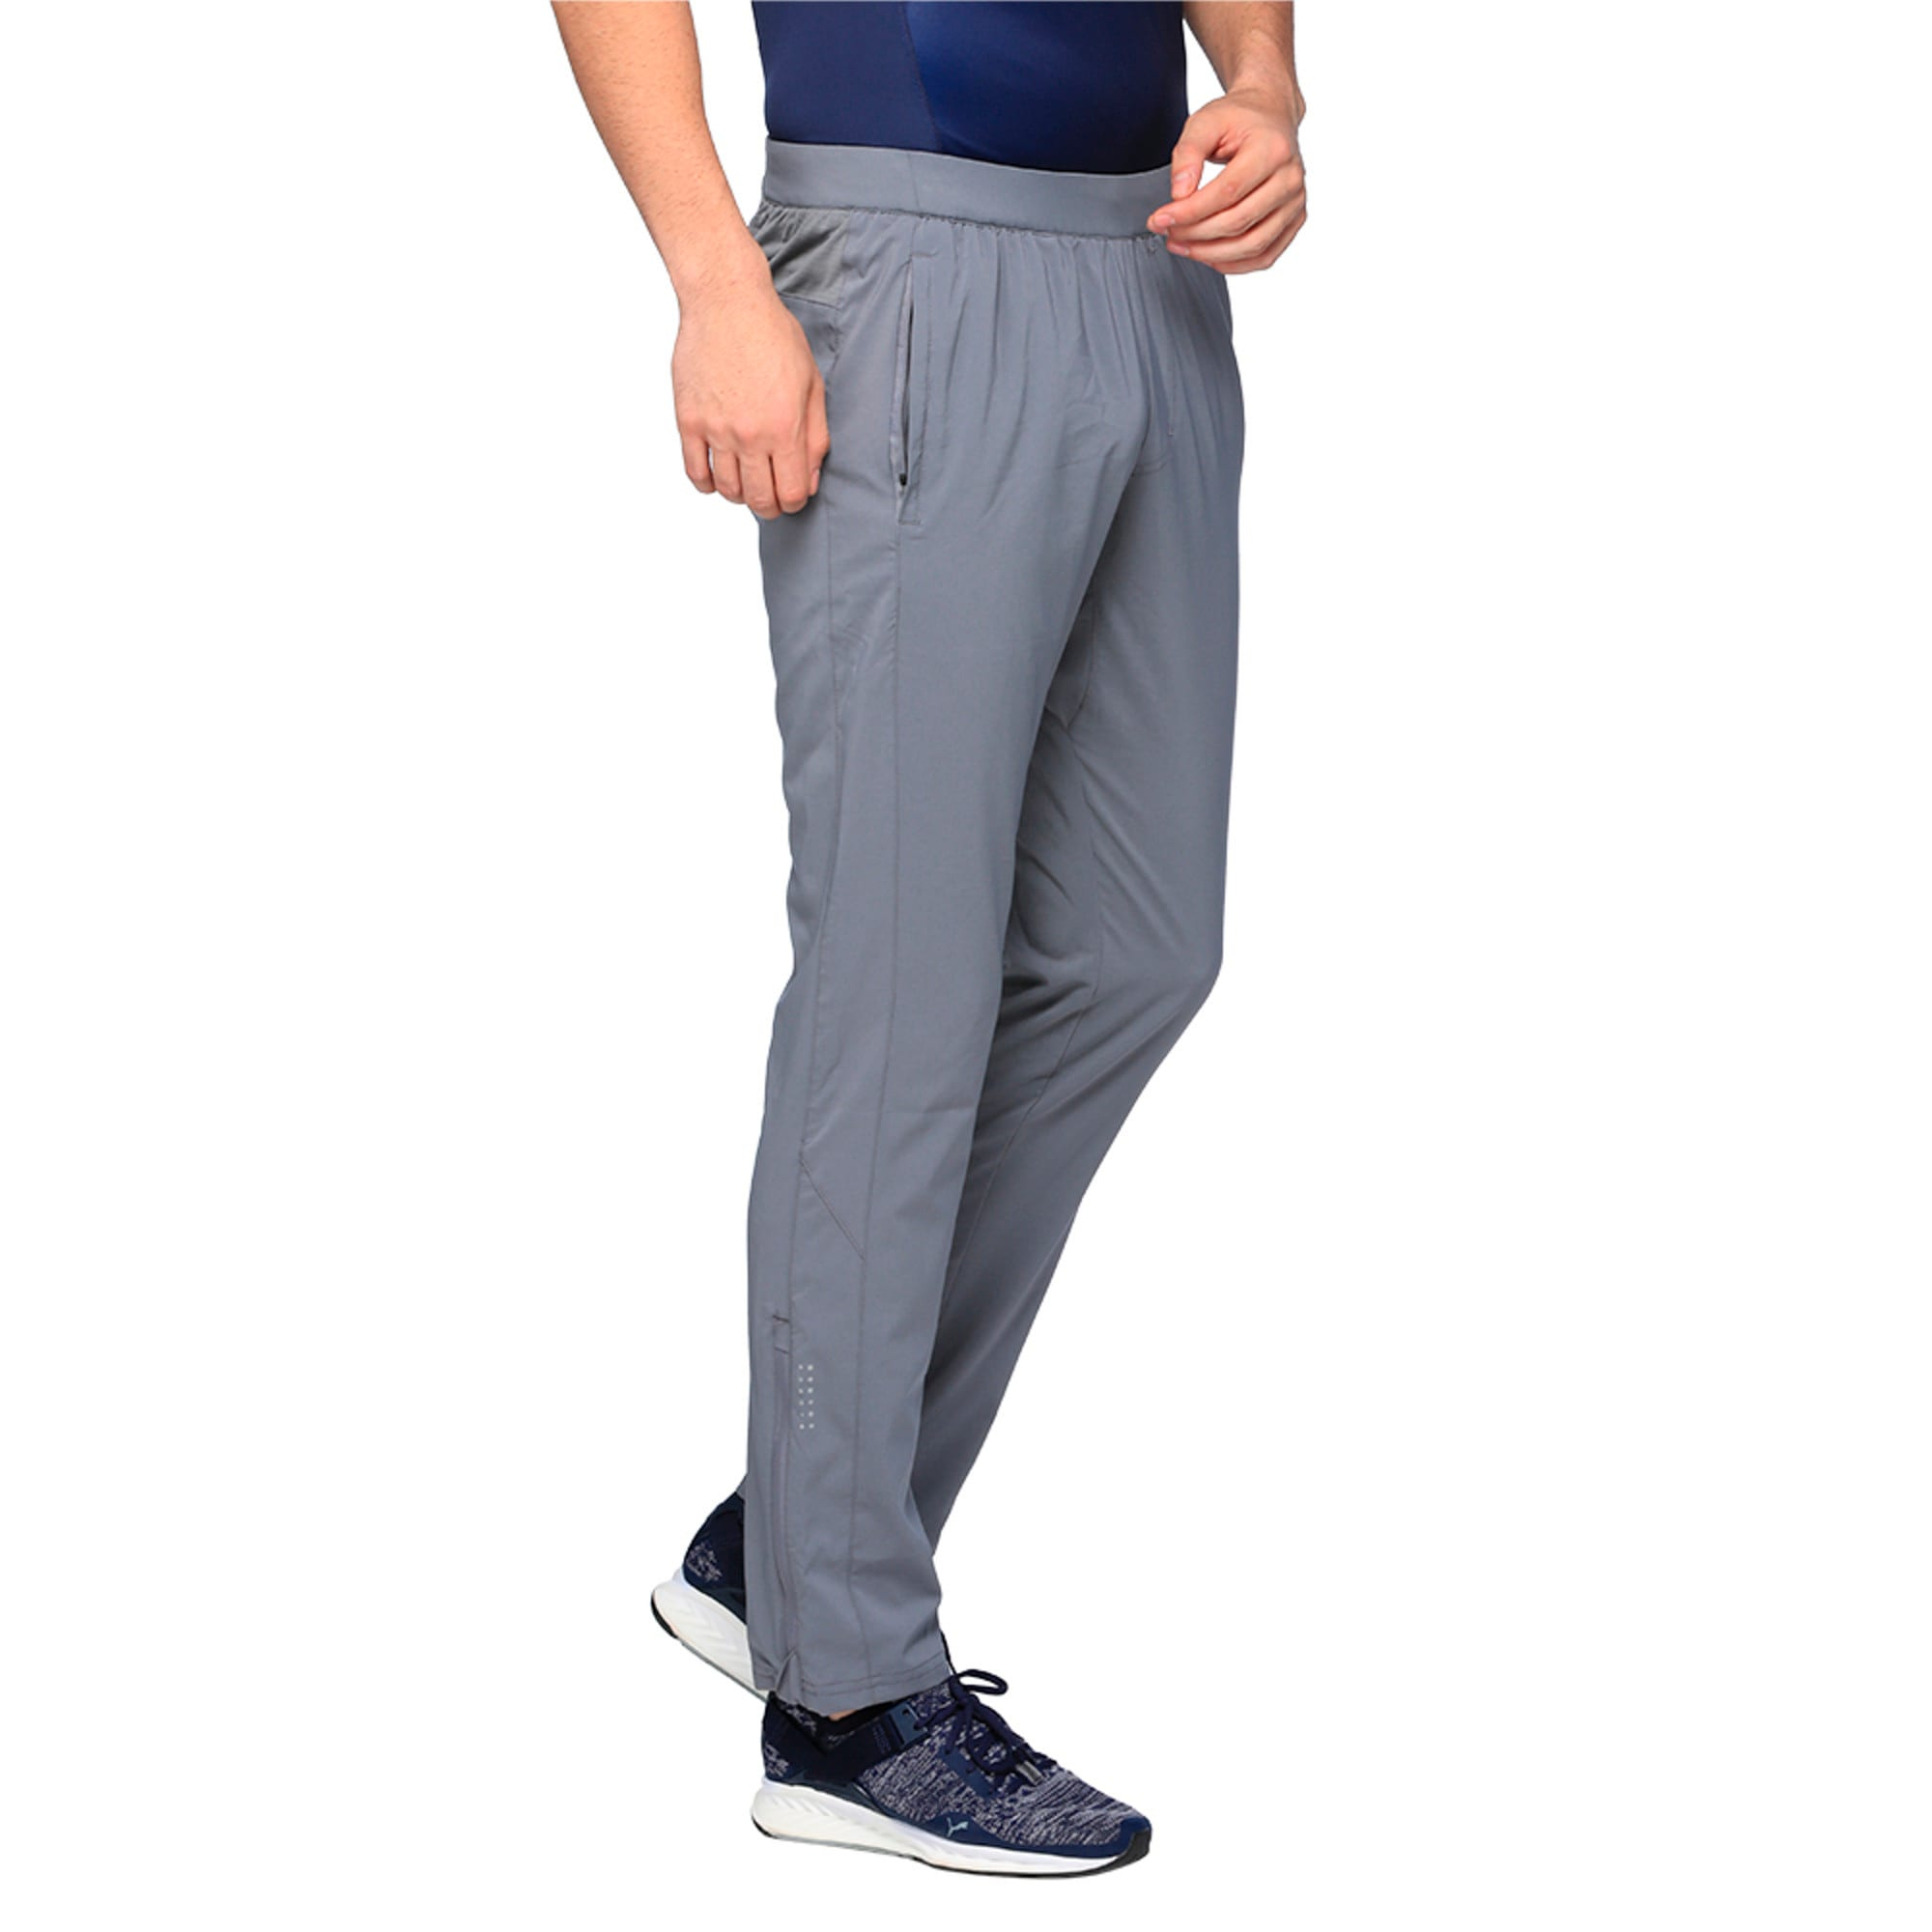 Thumbnail 2 of Running Men's Tapered Pants, QUIET SHADE, medium-IND